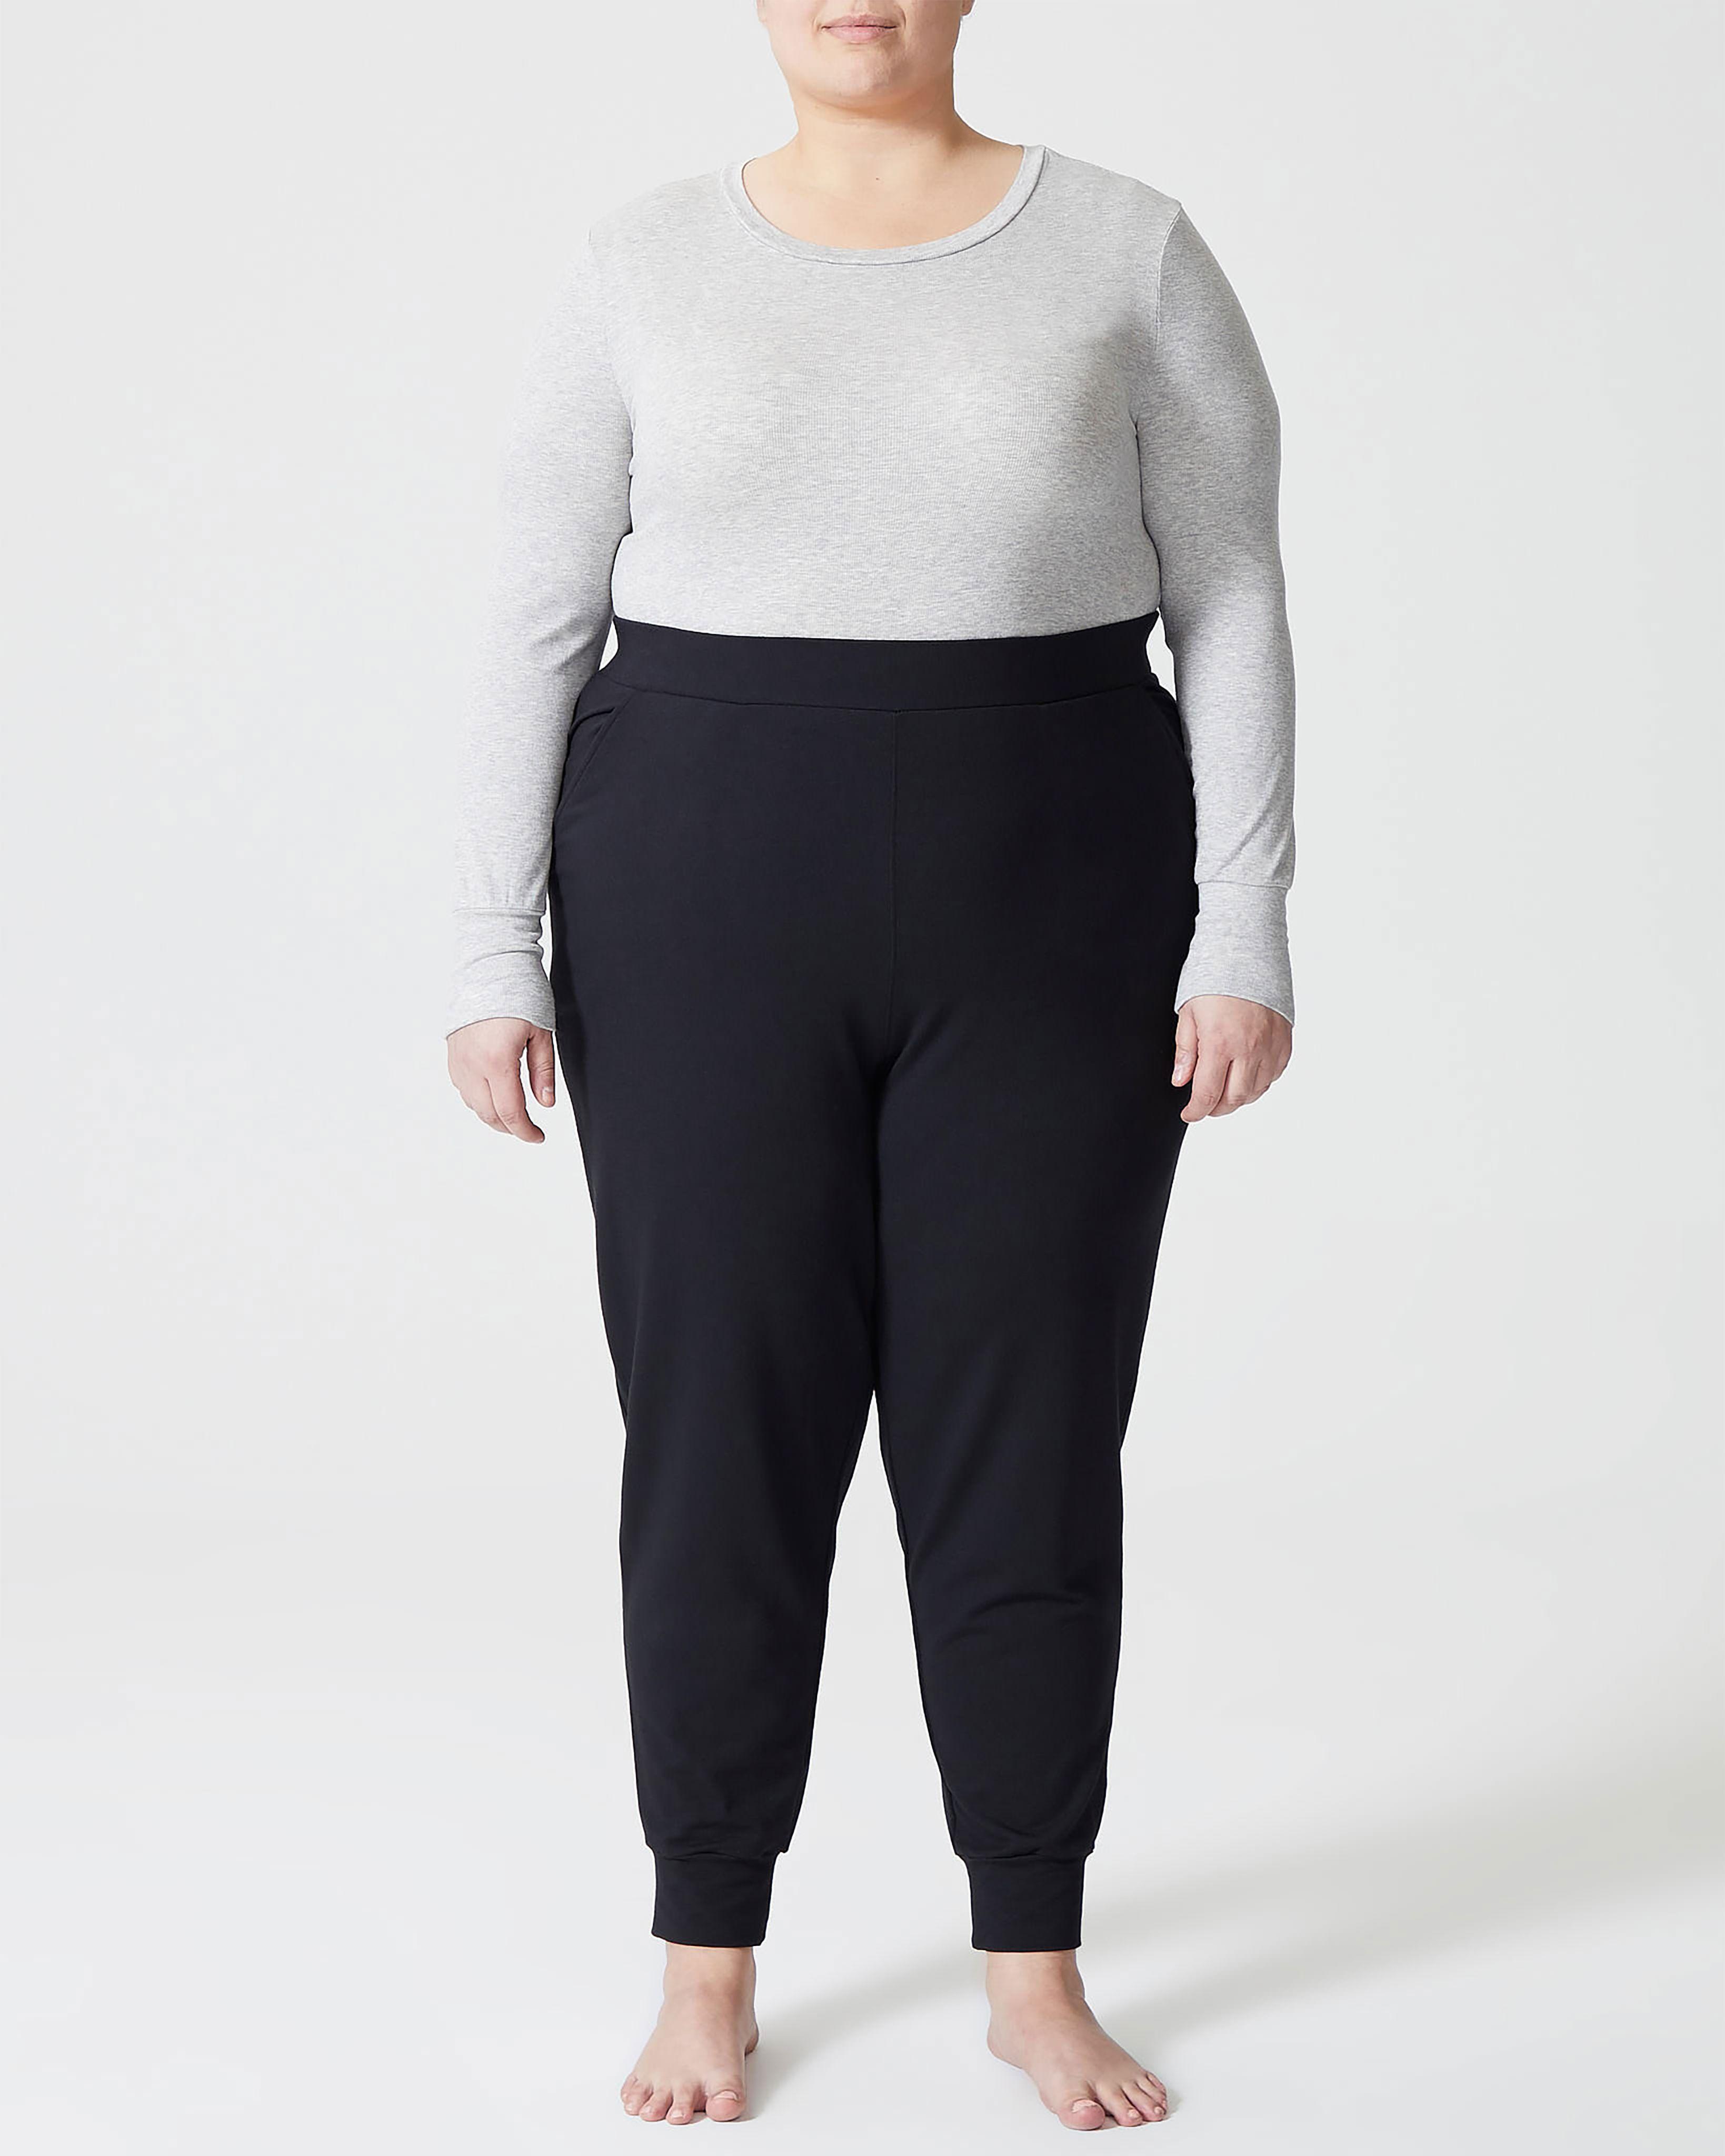 Hathaway Jersey Jogger Pants - Black